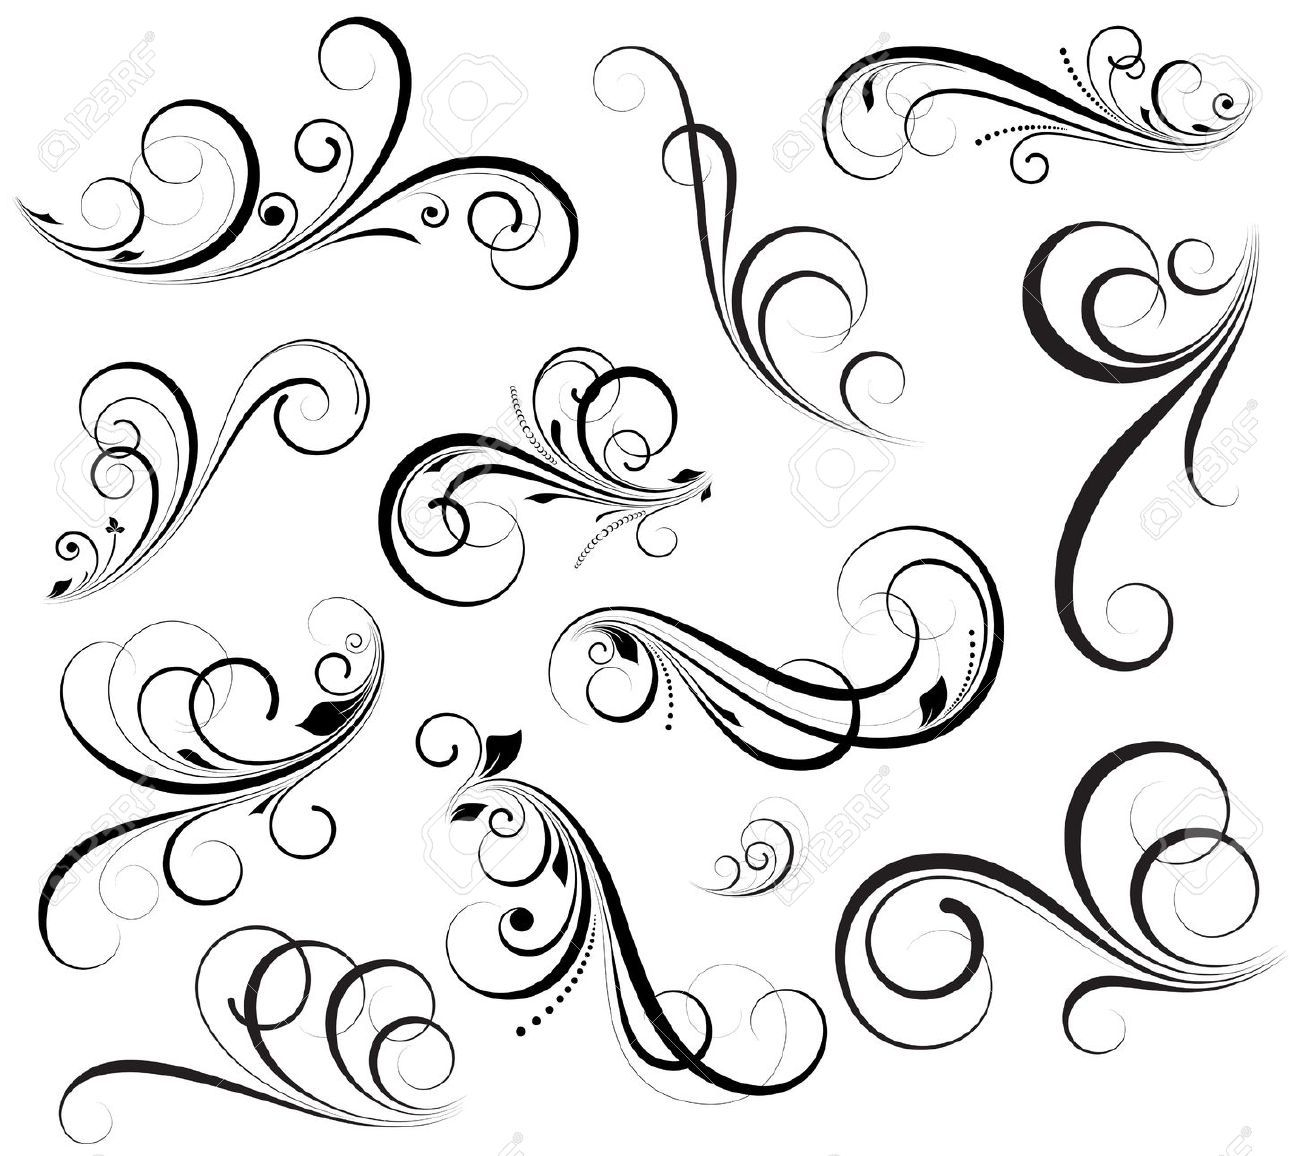 Swirls Vectors Royalty Free Cliparts Vectors And Stock